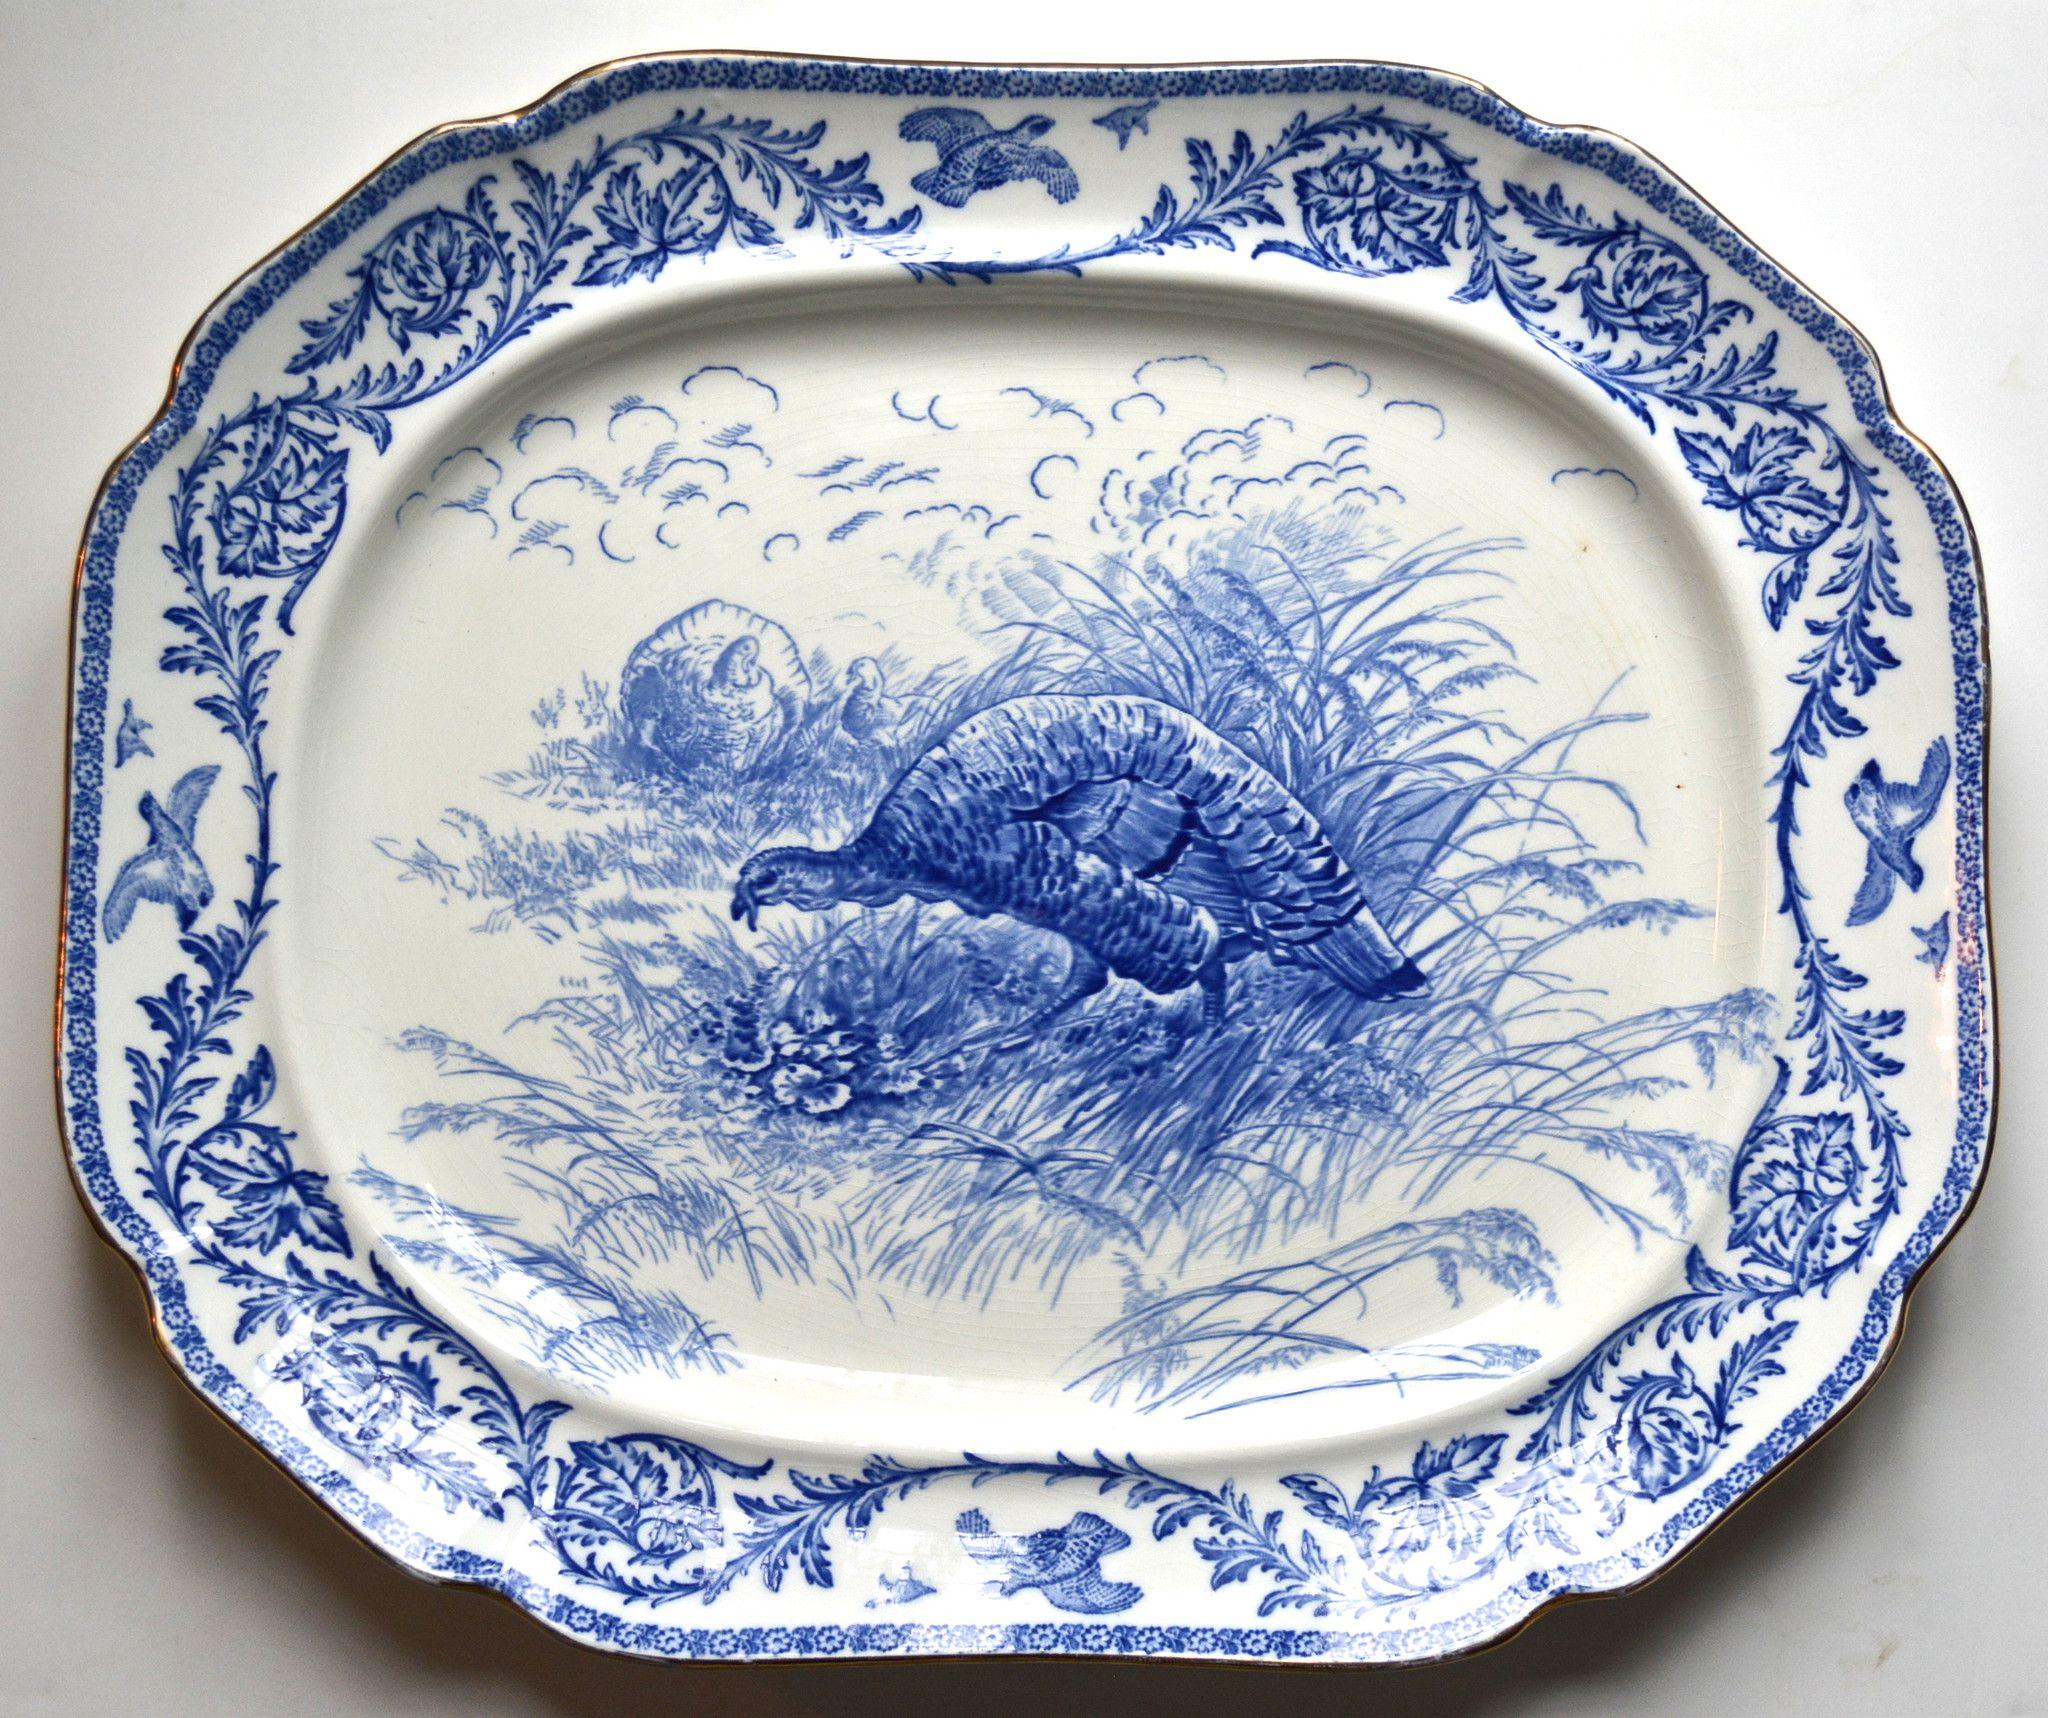 Antique Blue Transferware Staffordshire Thanksgiving Turkey Platter #flowblue #nancysdailydish #transferware #turkey #platter #thanksgiving #blueandwhite #staffordshire